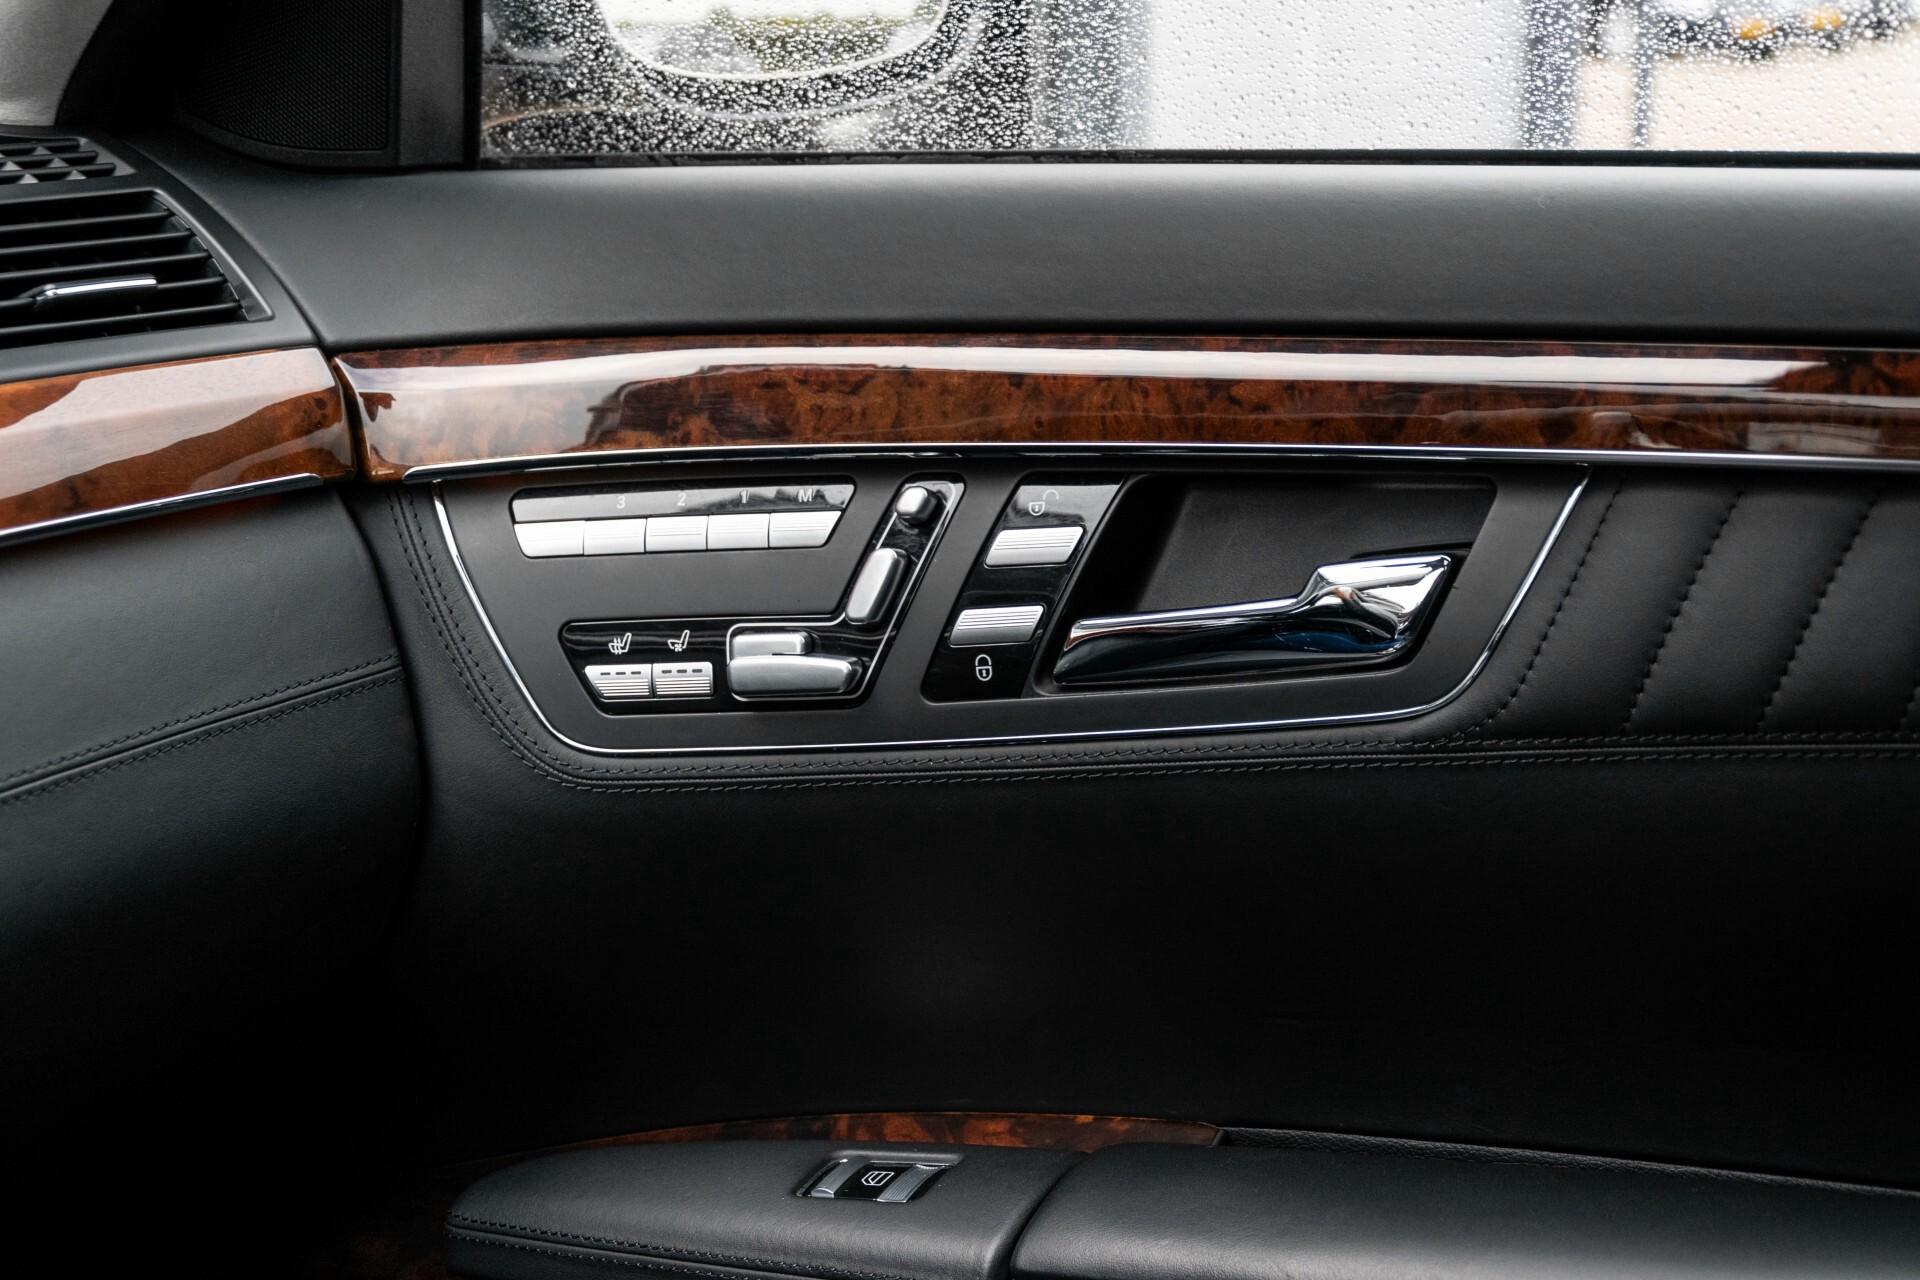 Mercedes-Benz S-Klasse 600 Lang 65 AMG Bi-Turbo Prestige Plus Aut5 Foto 52